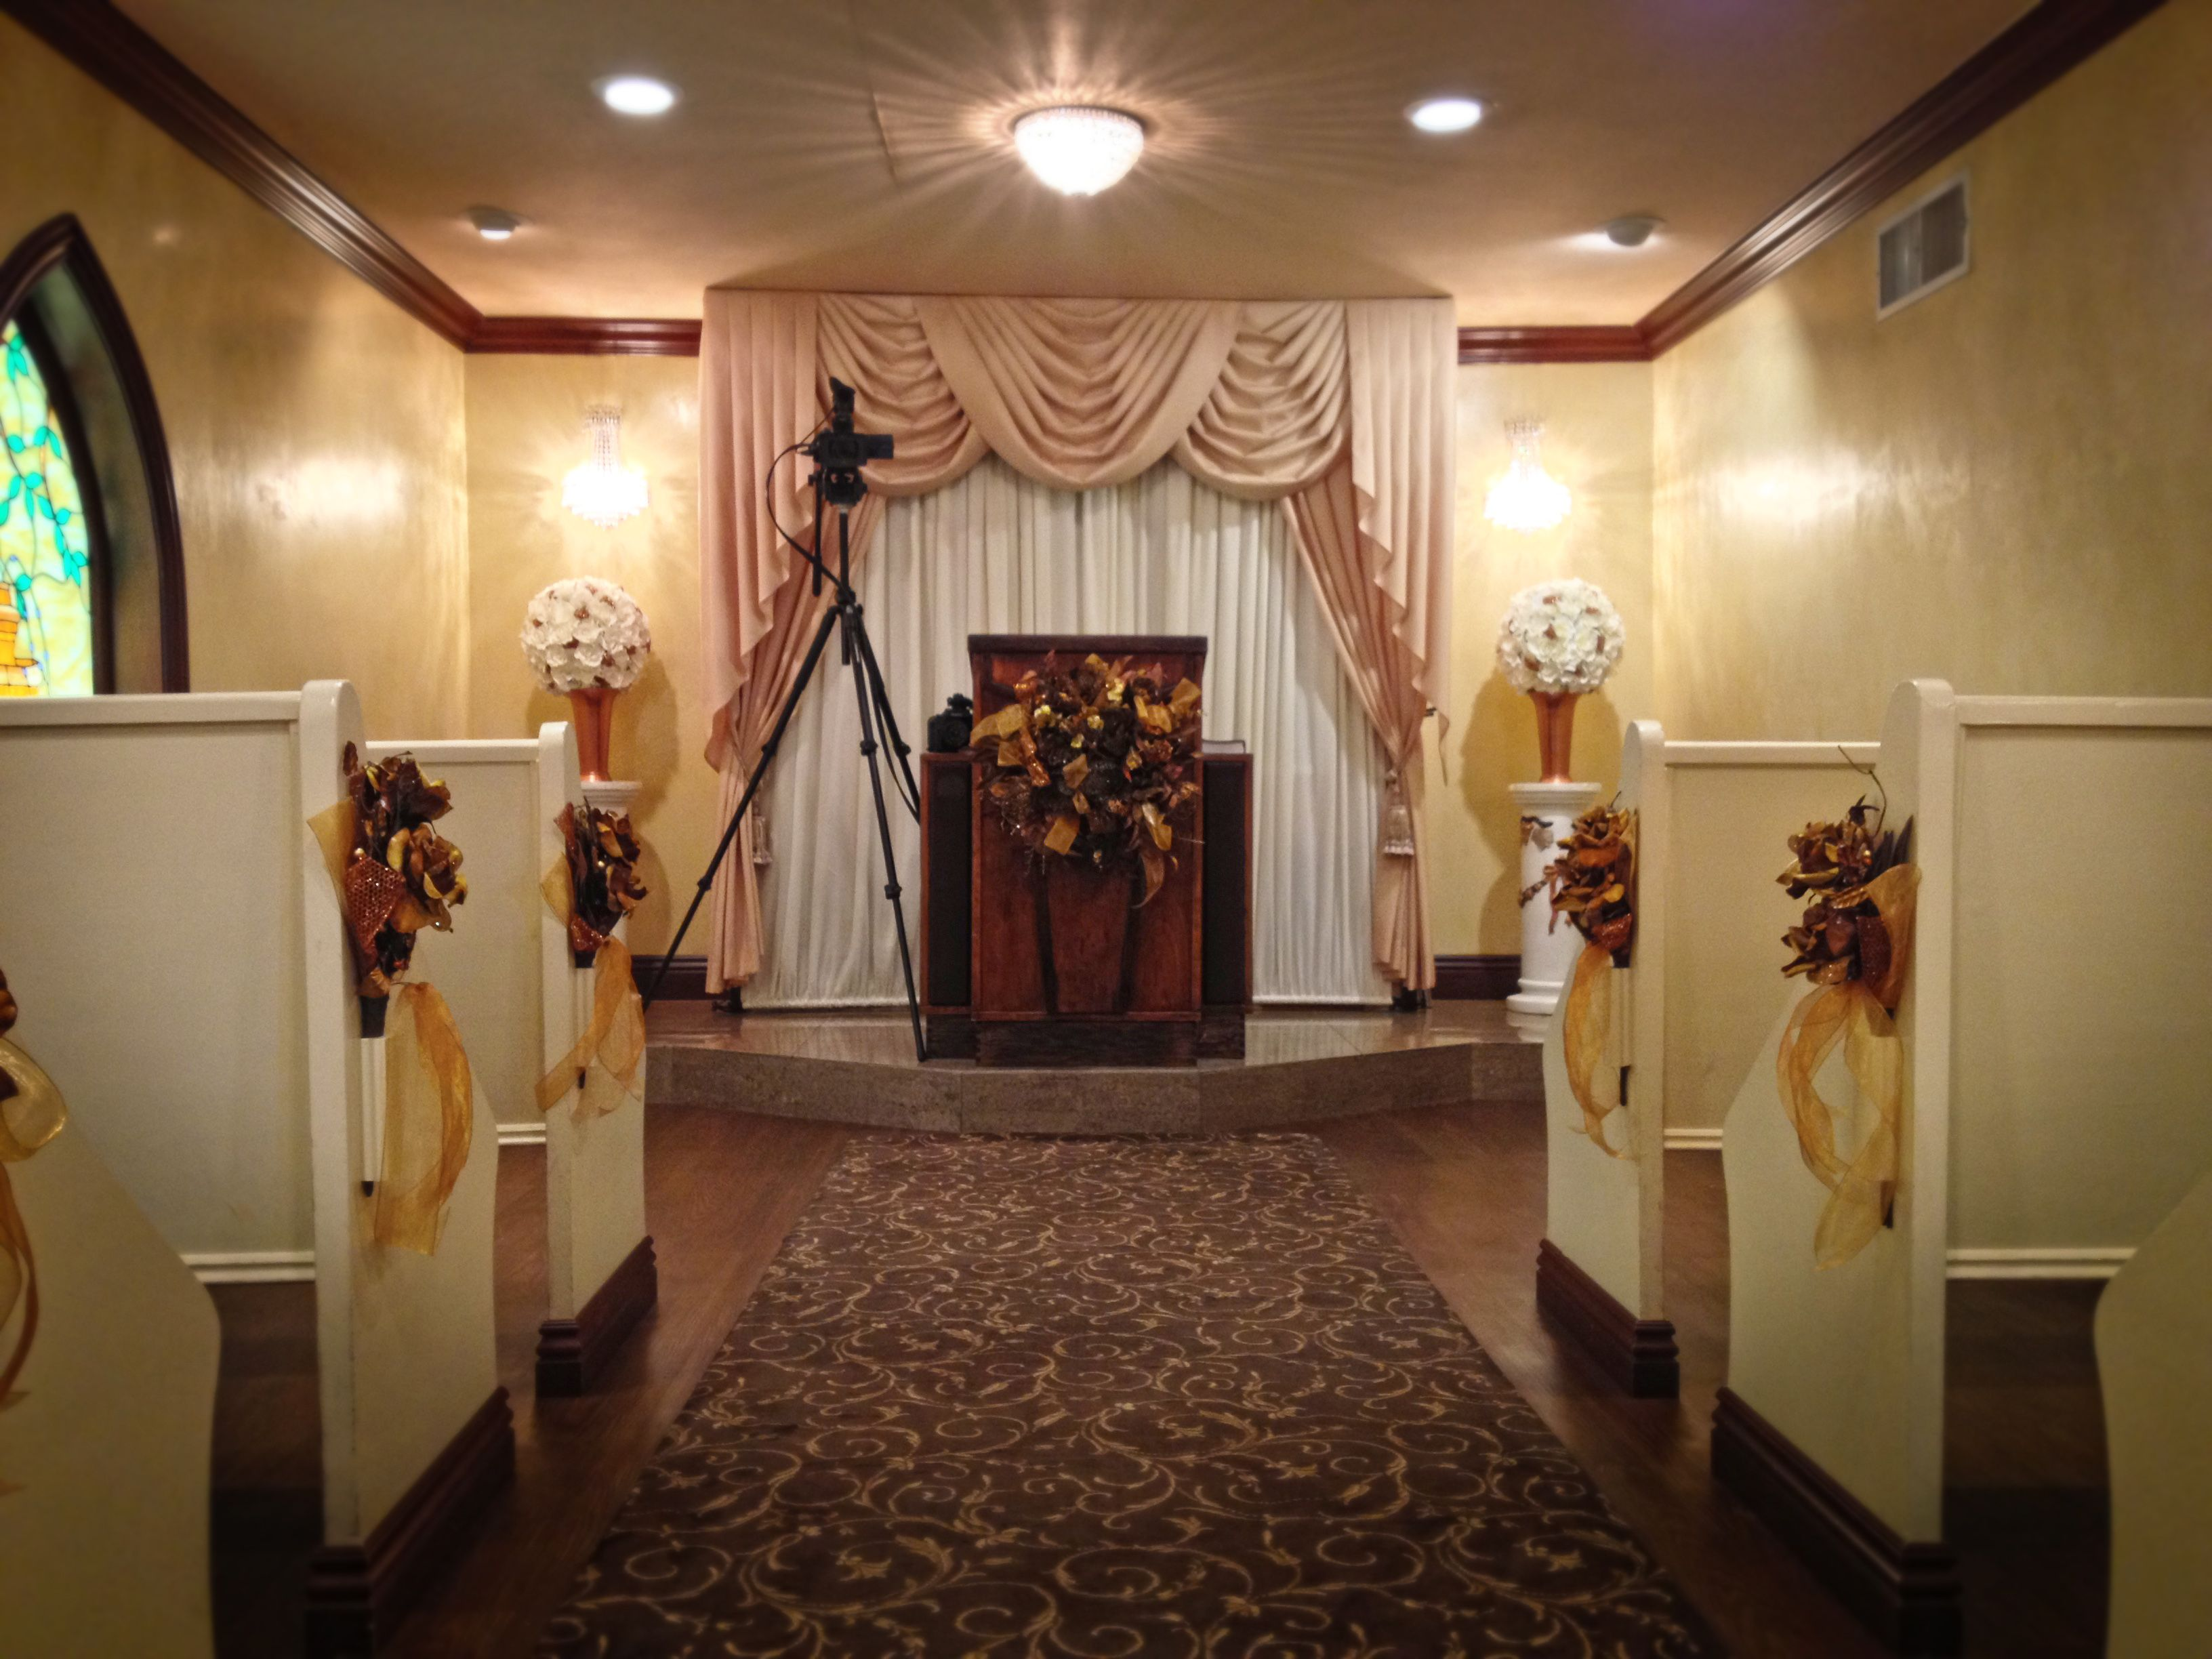 Brandon Paul My Elvis Graceland Wedding Chapel Vegas Backyard Reception Pinterest Chapels And Las Nevada